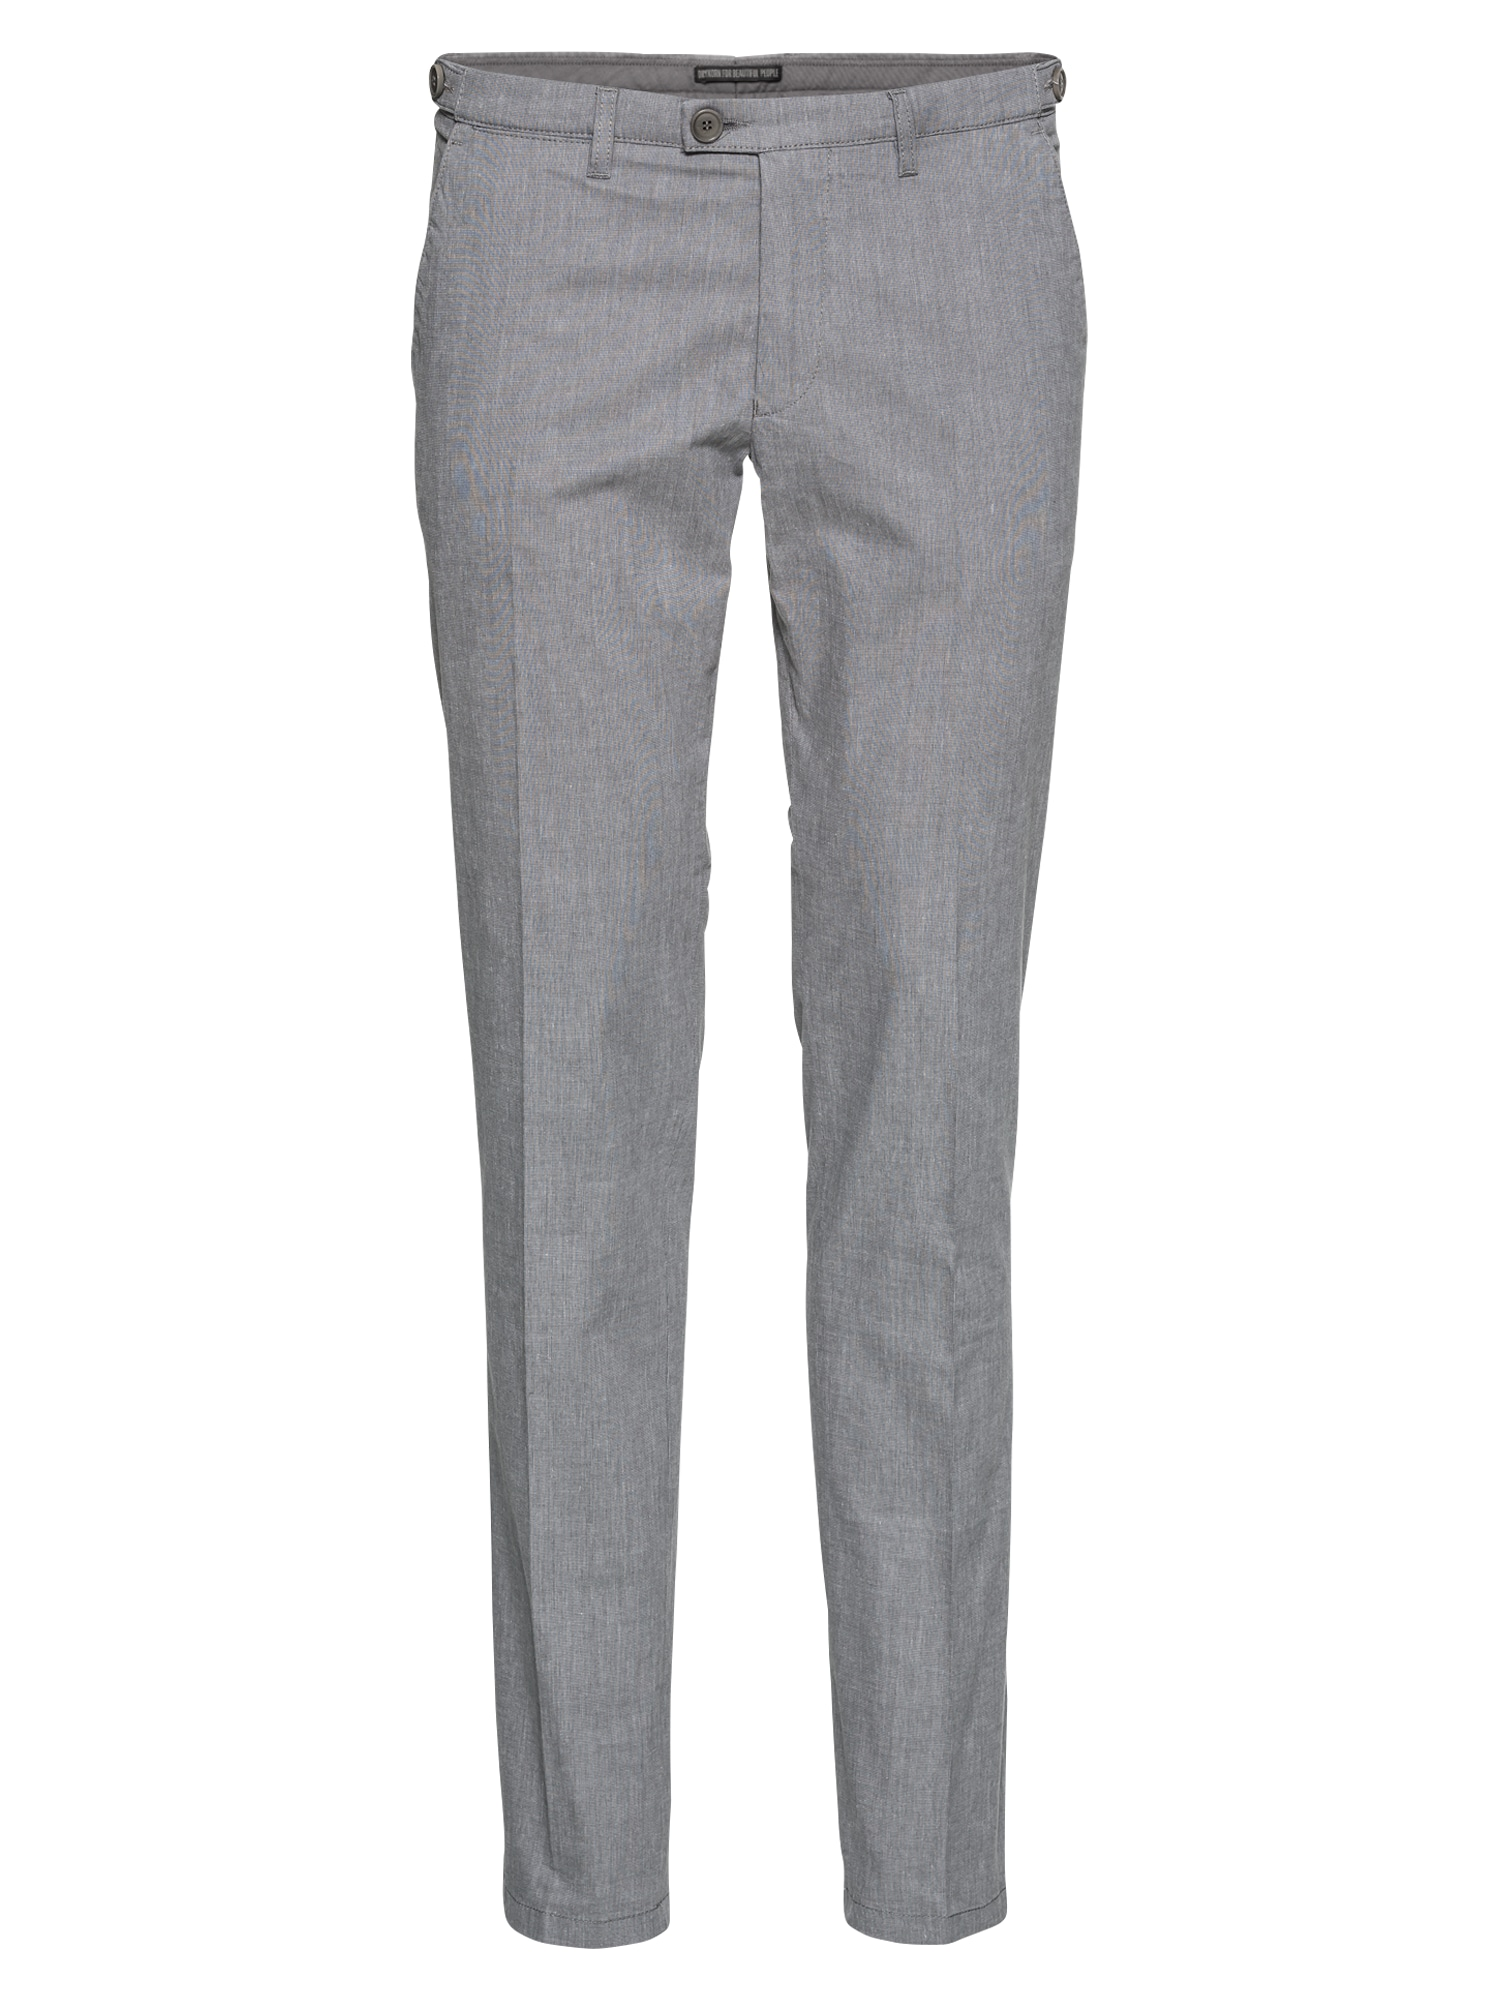 Kalhoty s puky KILL šedá DRYKORN